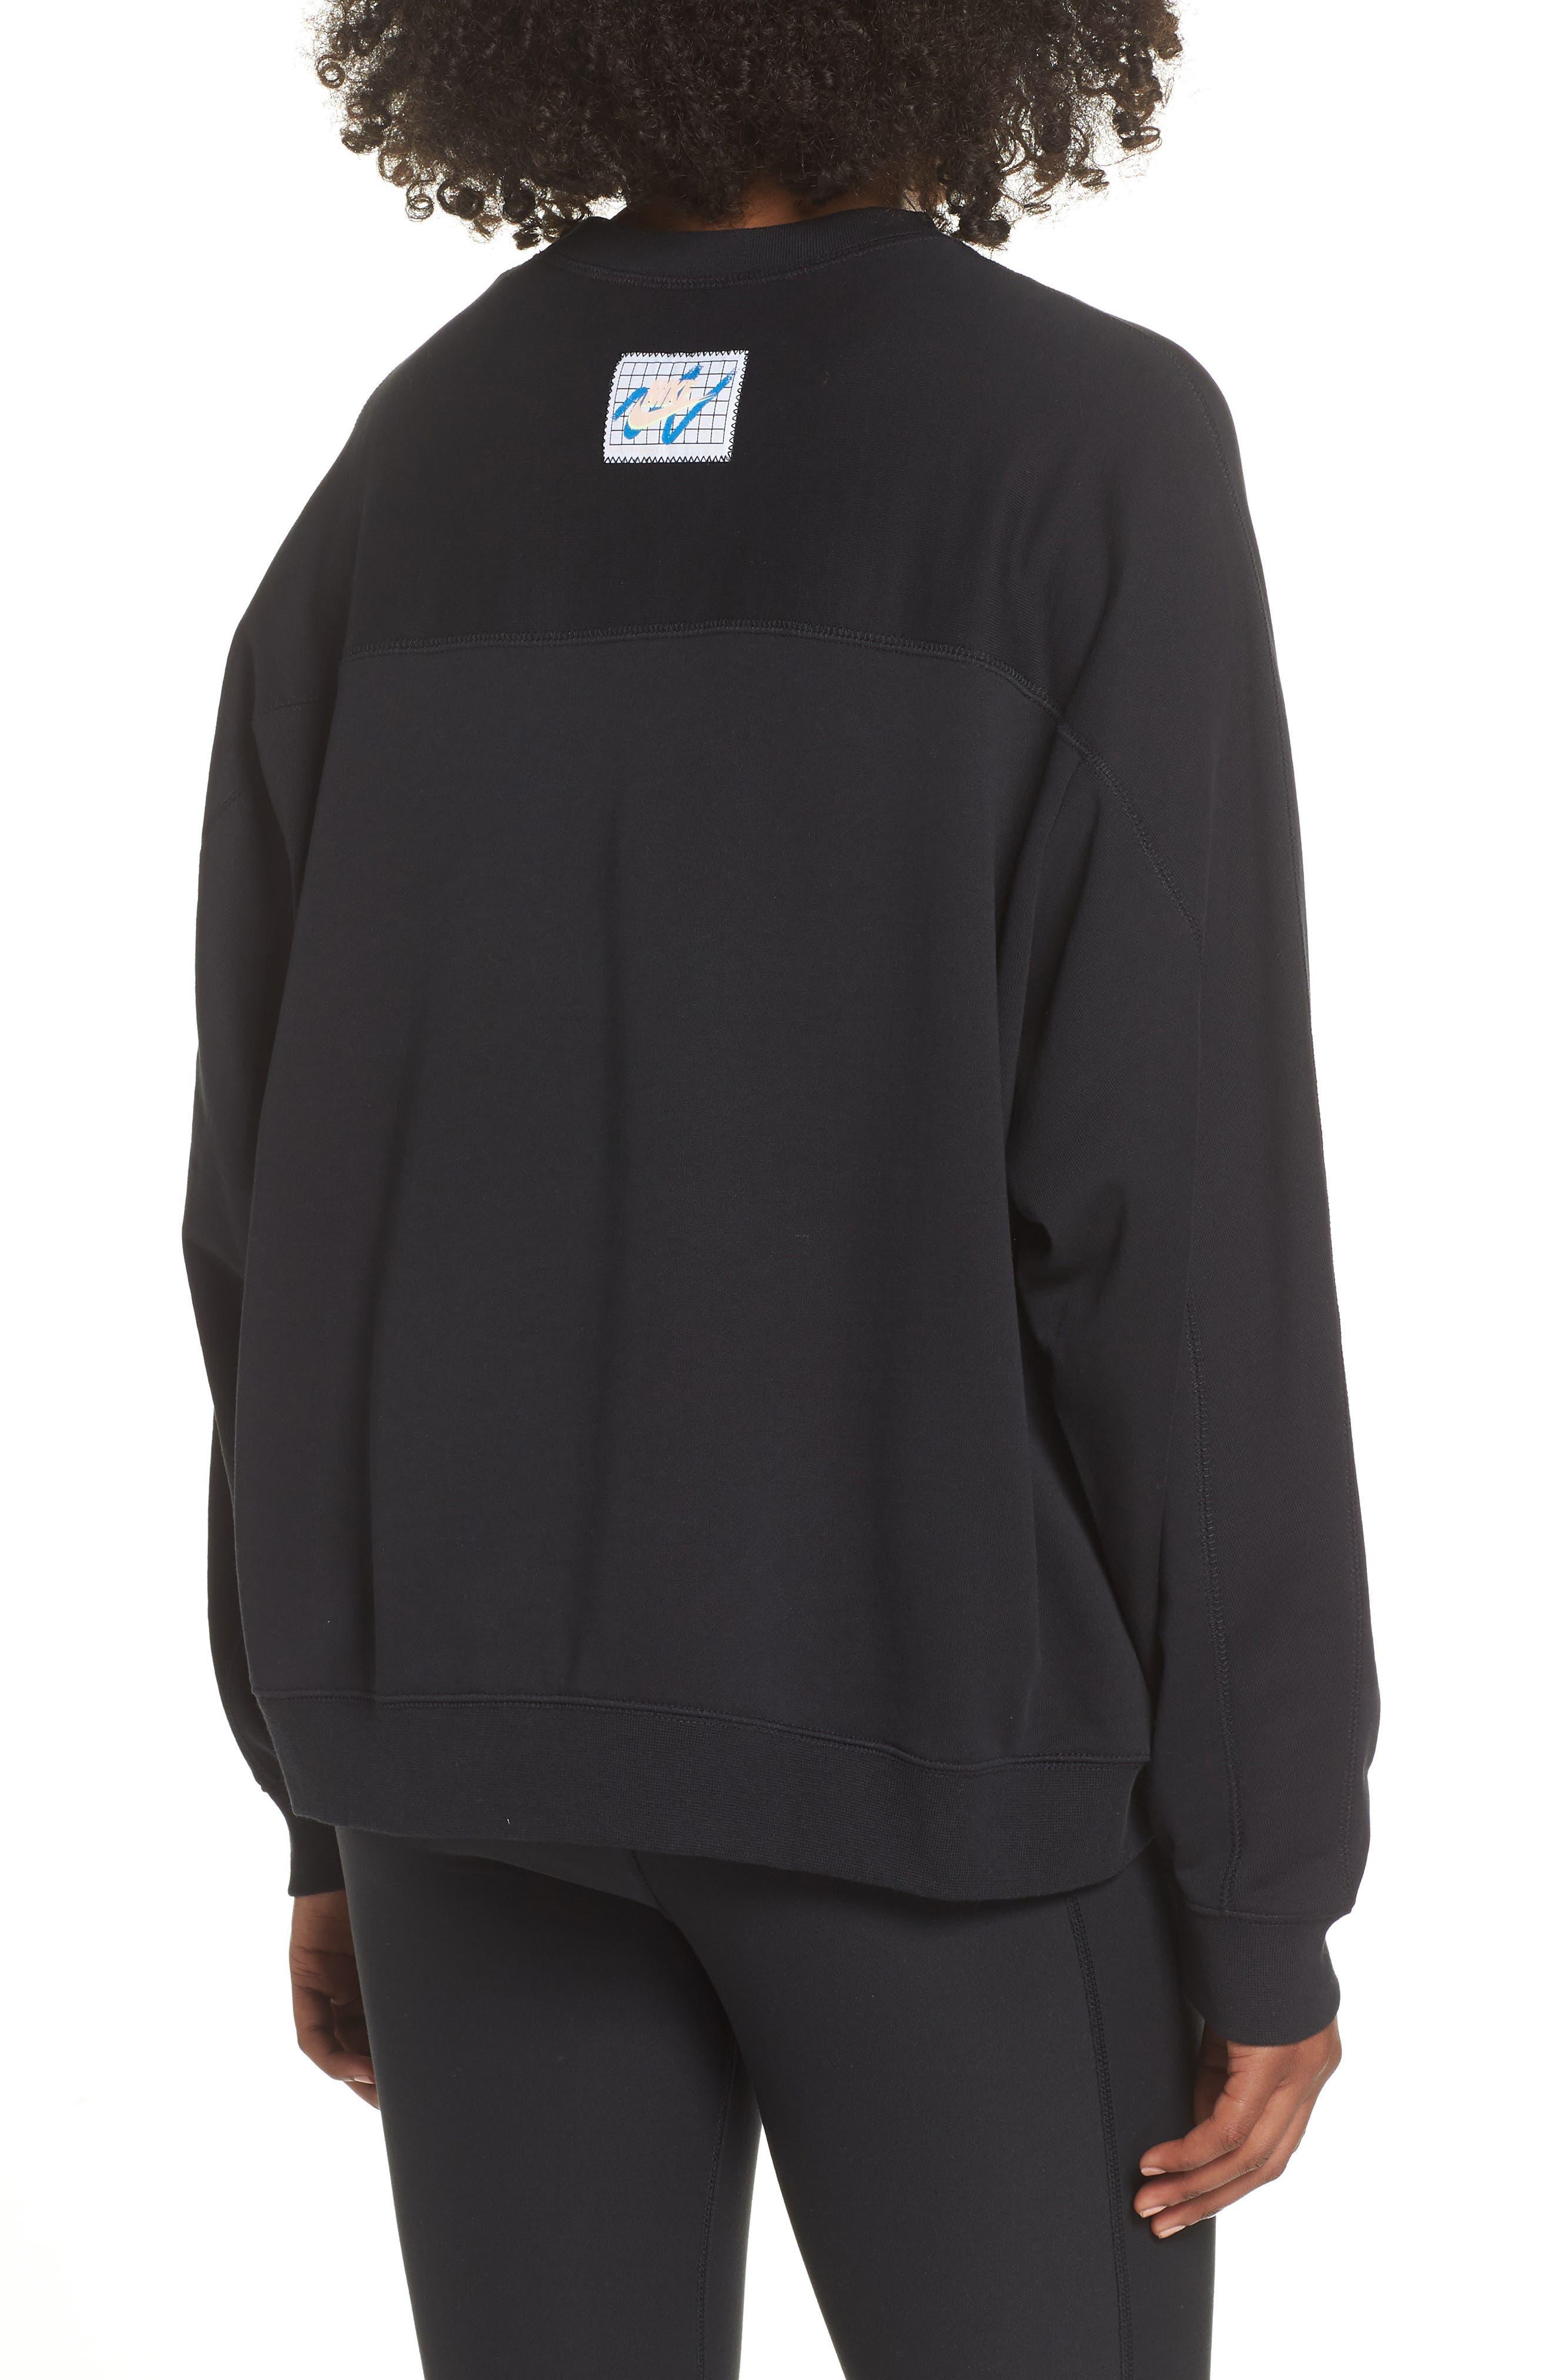 Archive Sweatshirt,                             Alternate thumbnail 2, color,                             BLACK/ BLACK/ BLACK